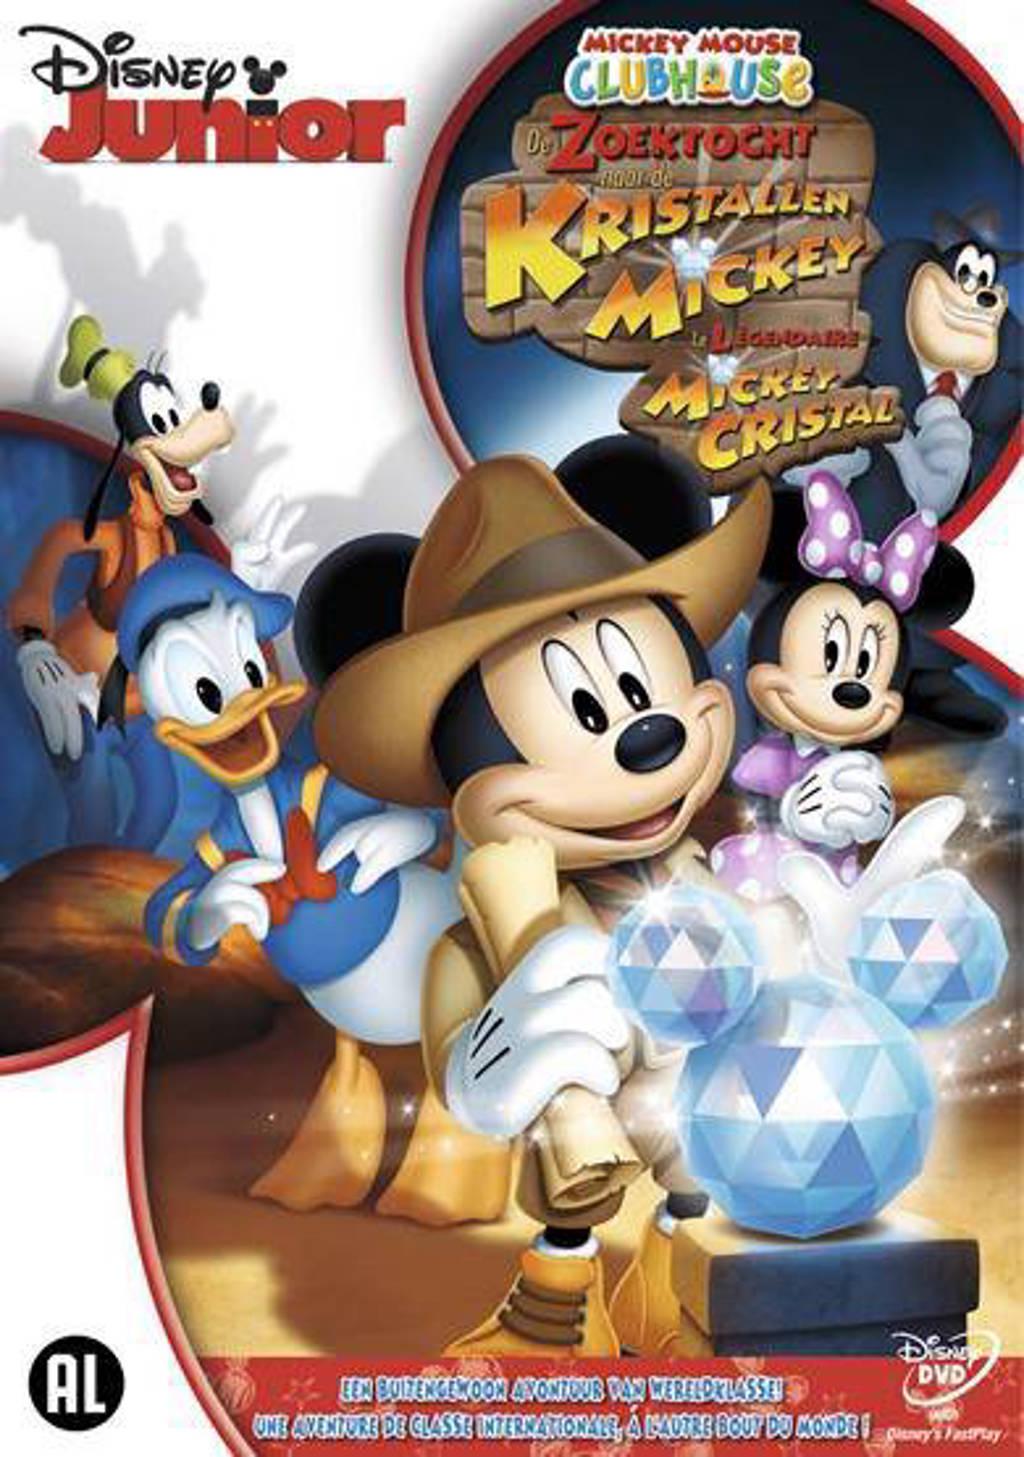 Mickey Mouse clubhouse - Zoektocht naar de kristallen Mickey (DVD)